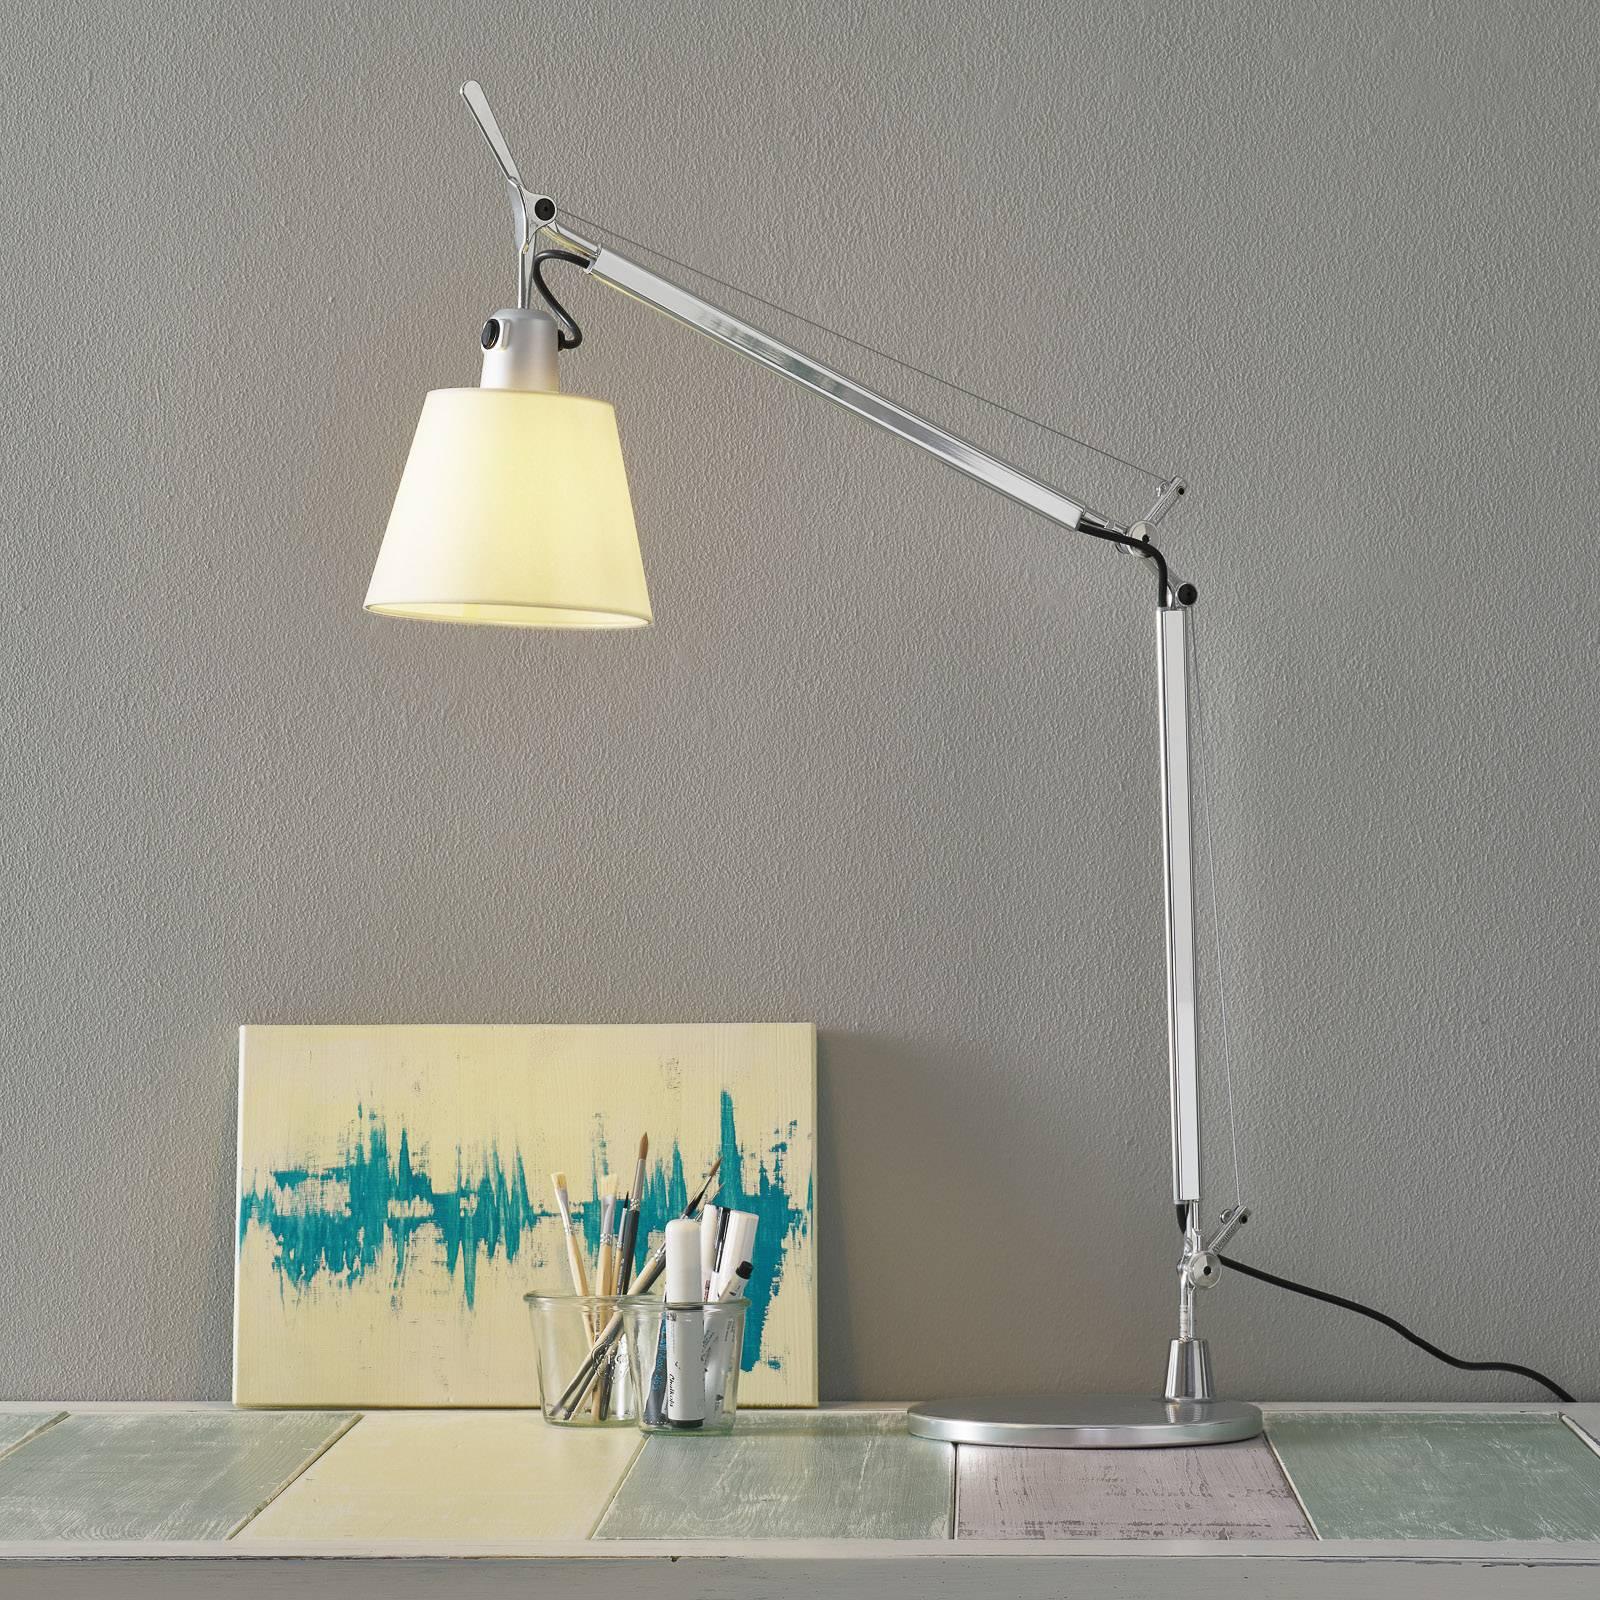 Artemide Tolomeo Basculante Designer-Tischleuchte